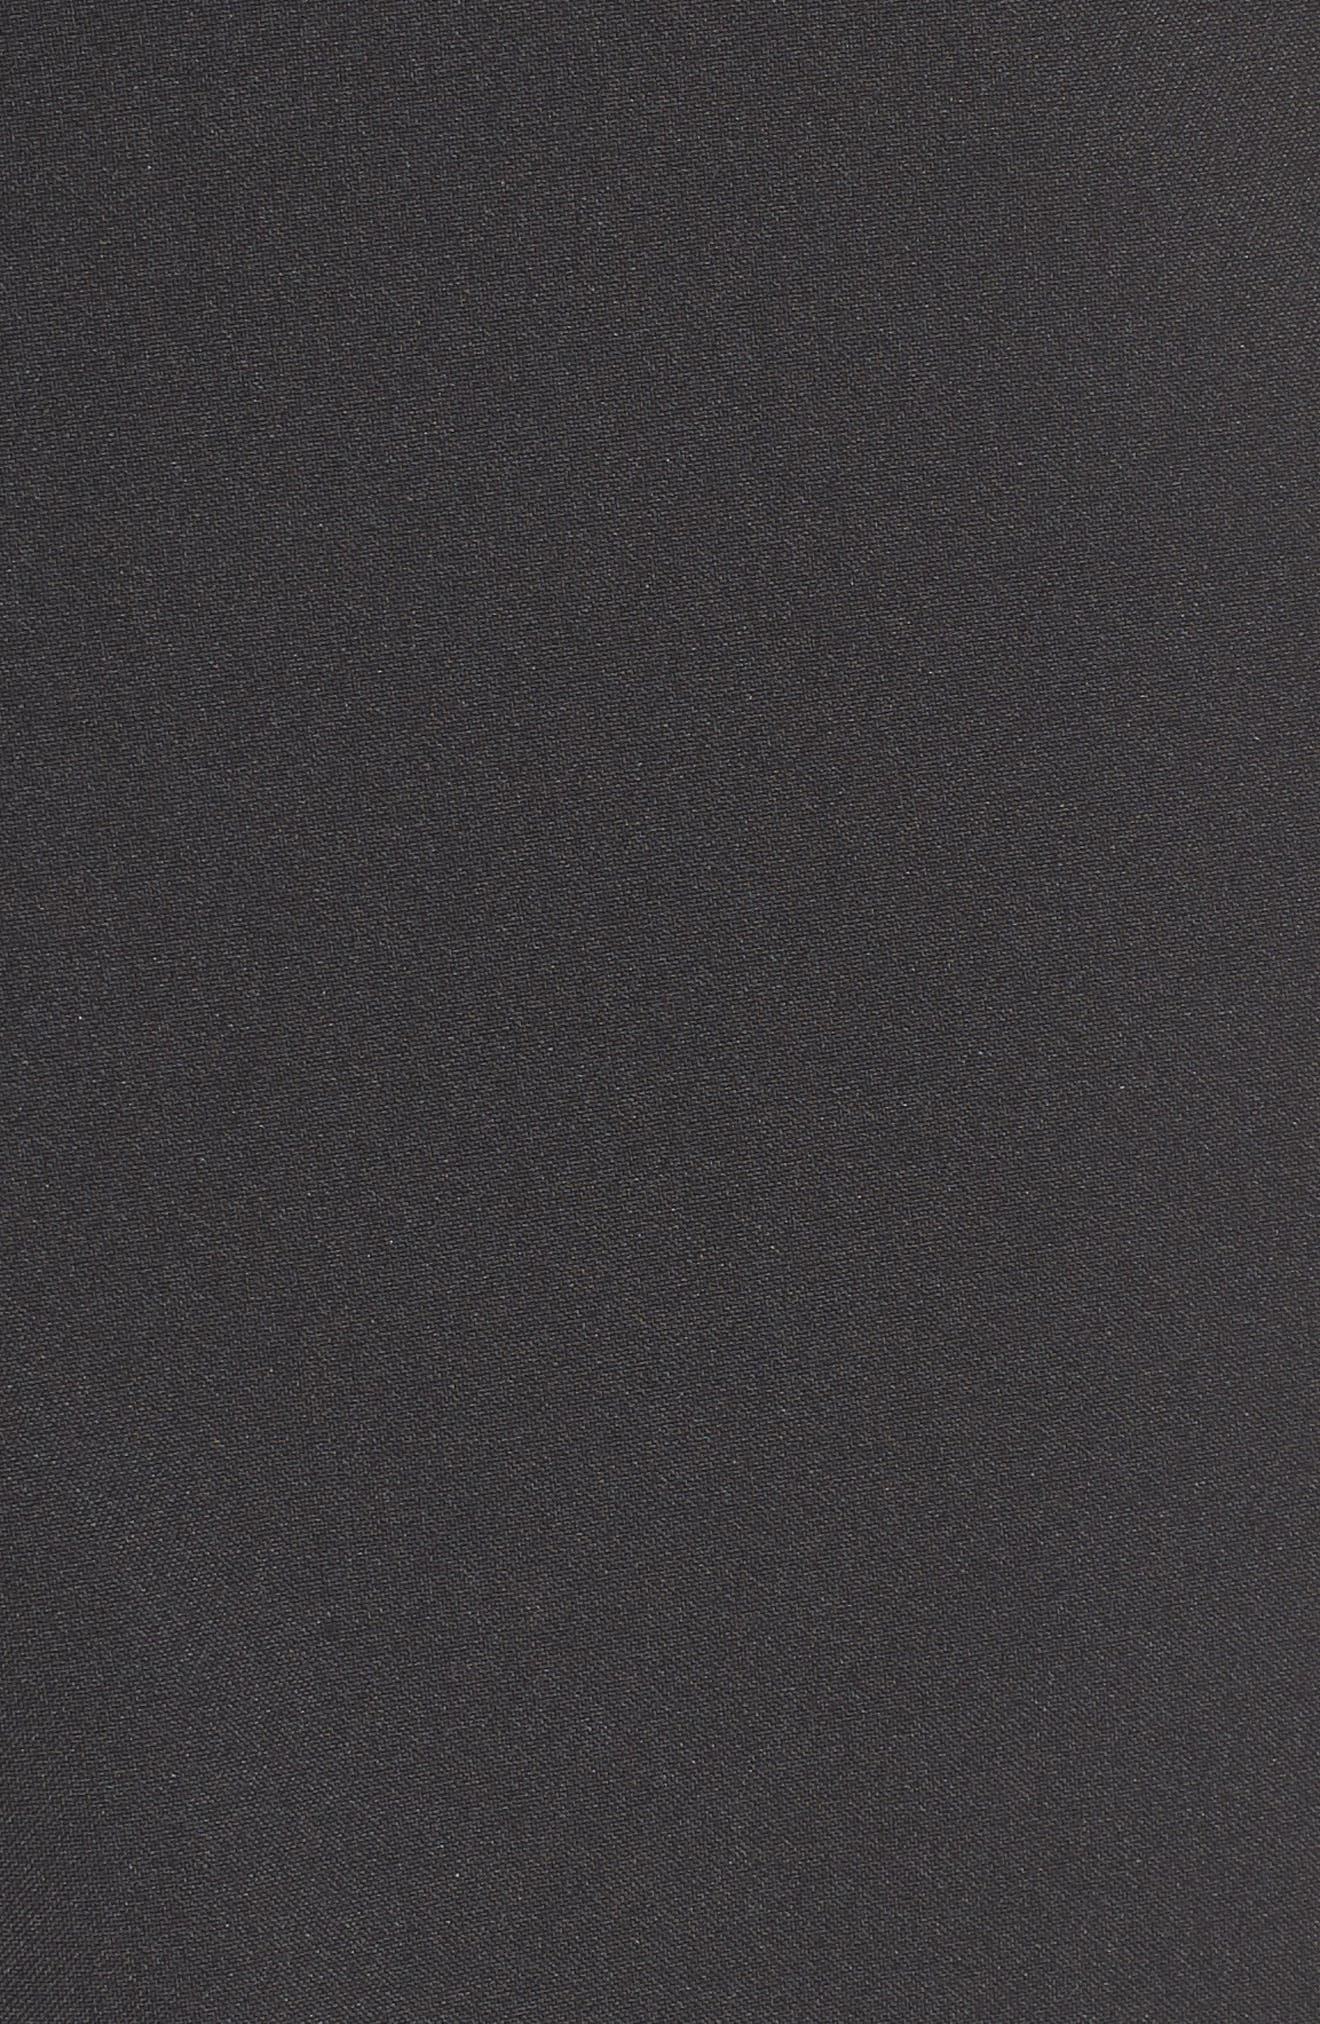 Pipeline Hybrid Shorts,                             Alternate thumbnail 5, color,                             Black